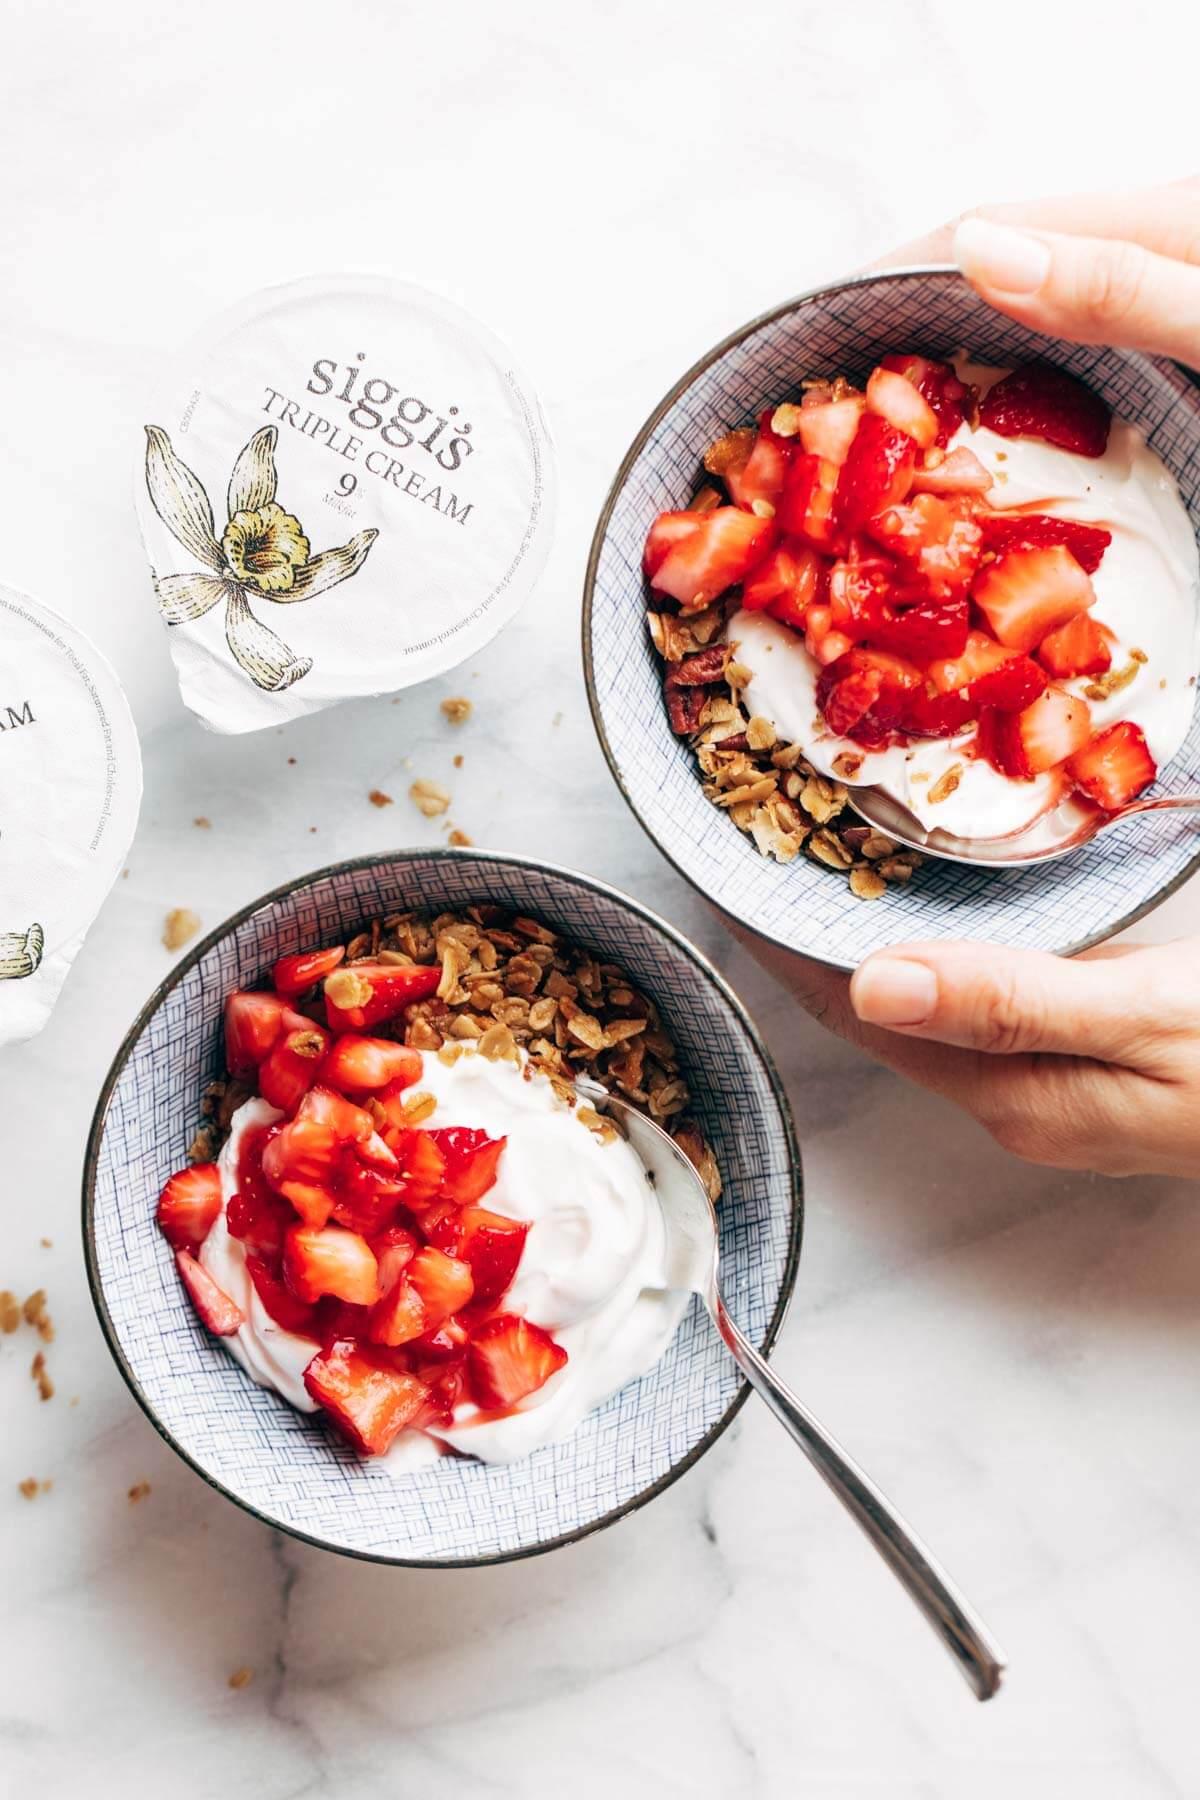 17. Strawberry Shortcake Yogurt Bowl